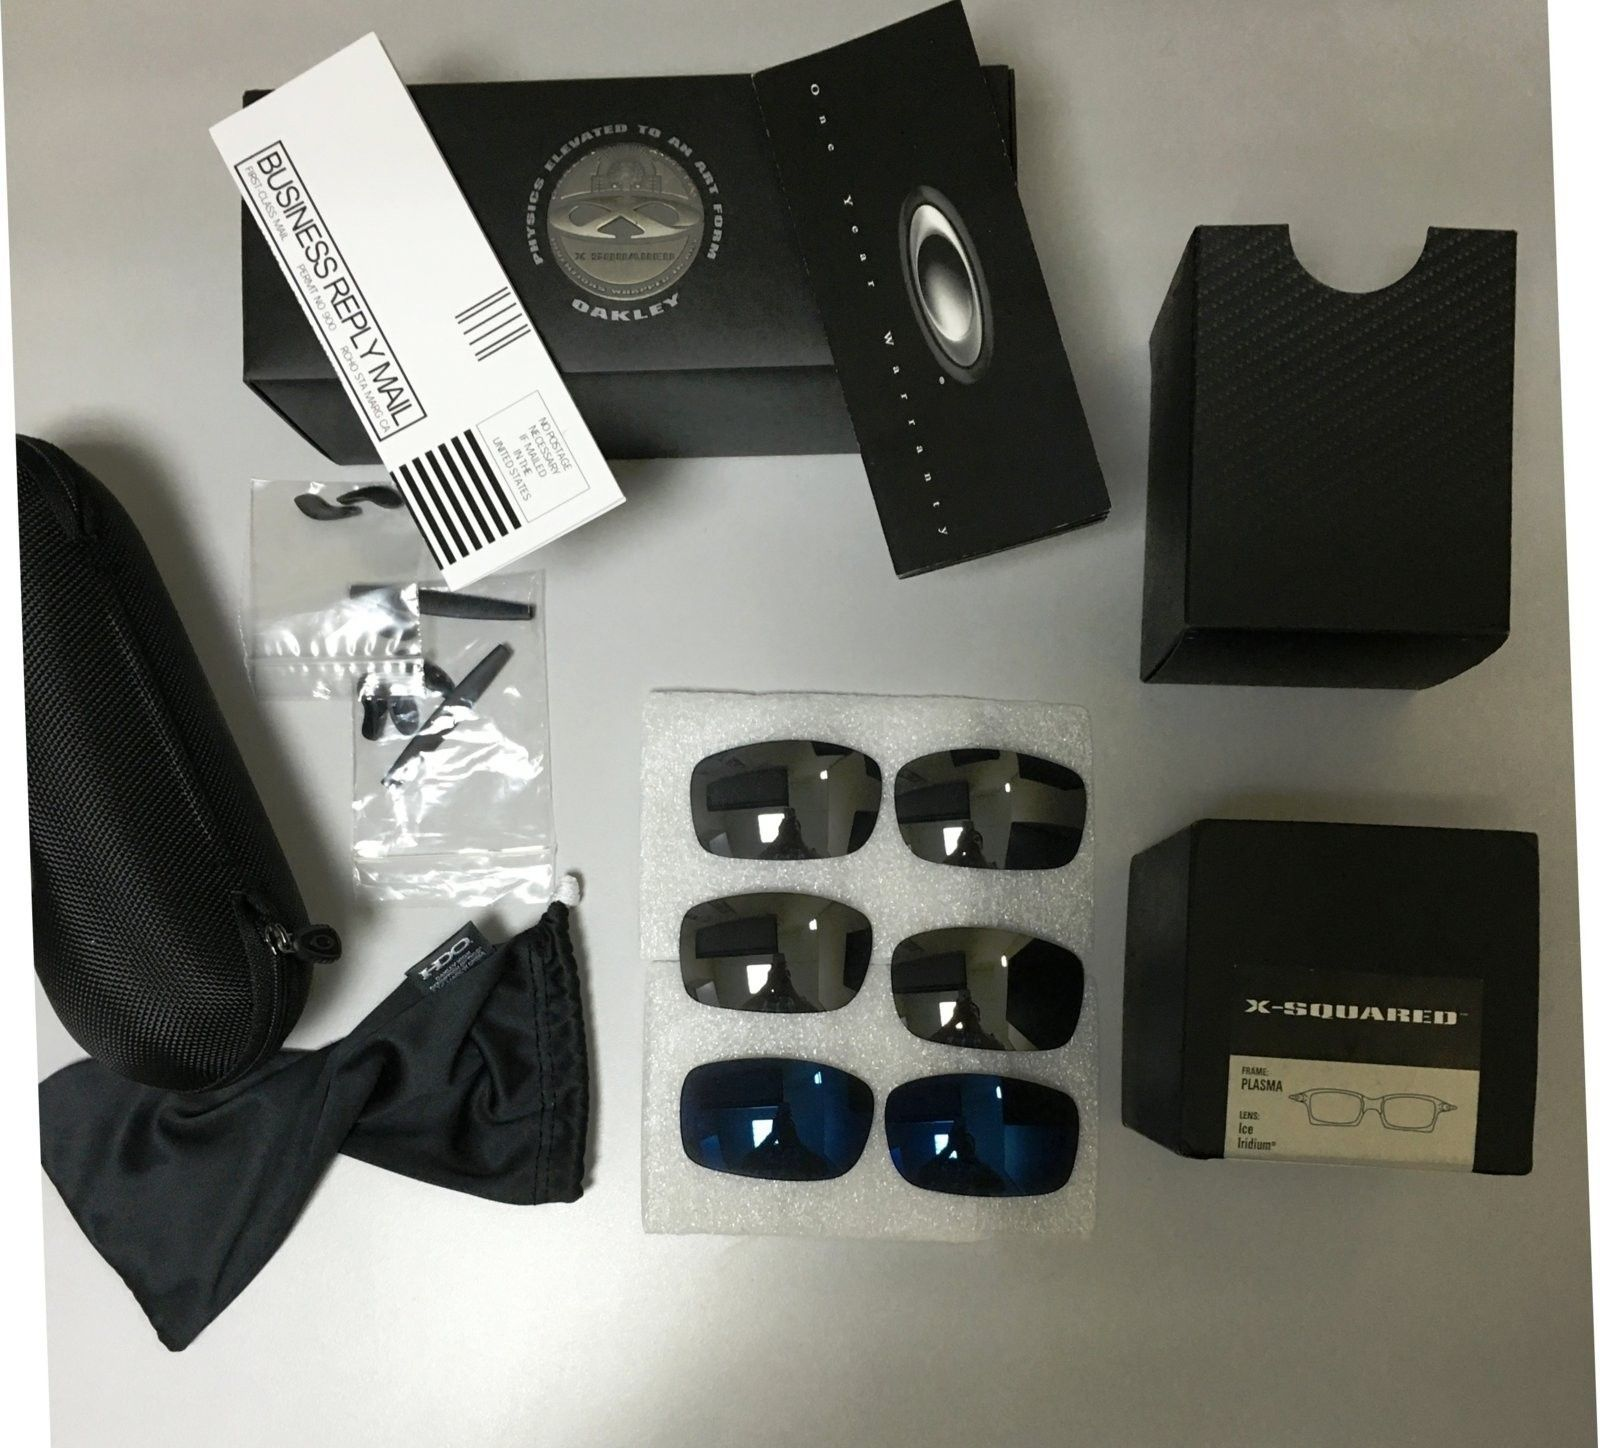 Box for XS Plasma/Ice, XS OEM lenses, XS OEM rubbers - image (2).jpeg